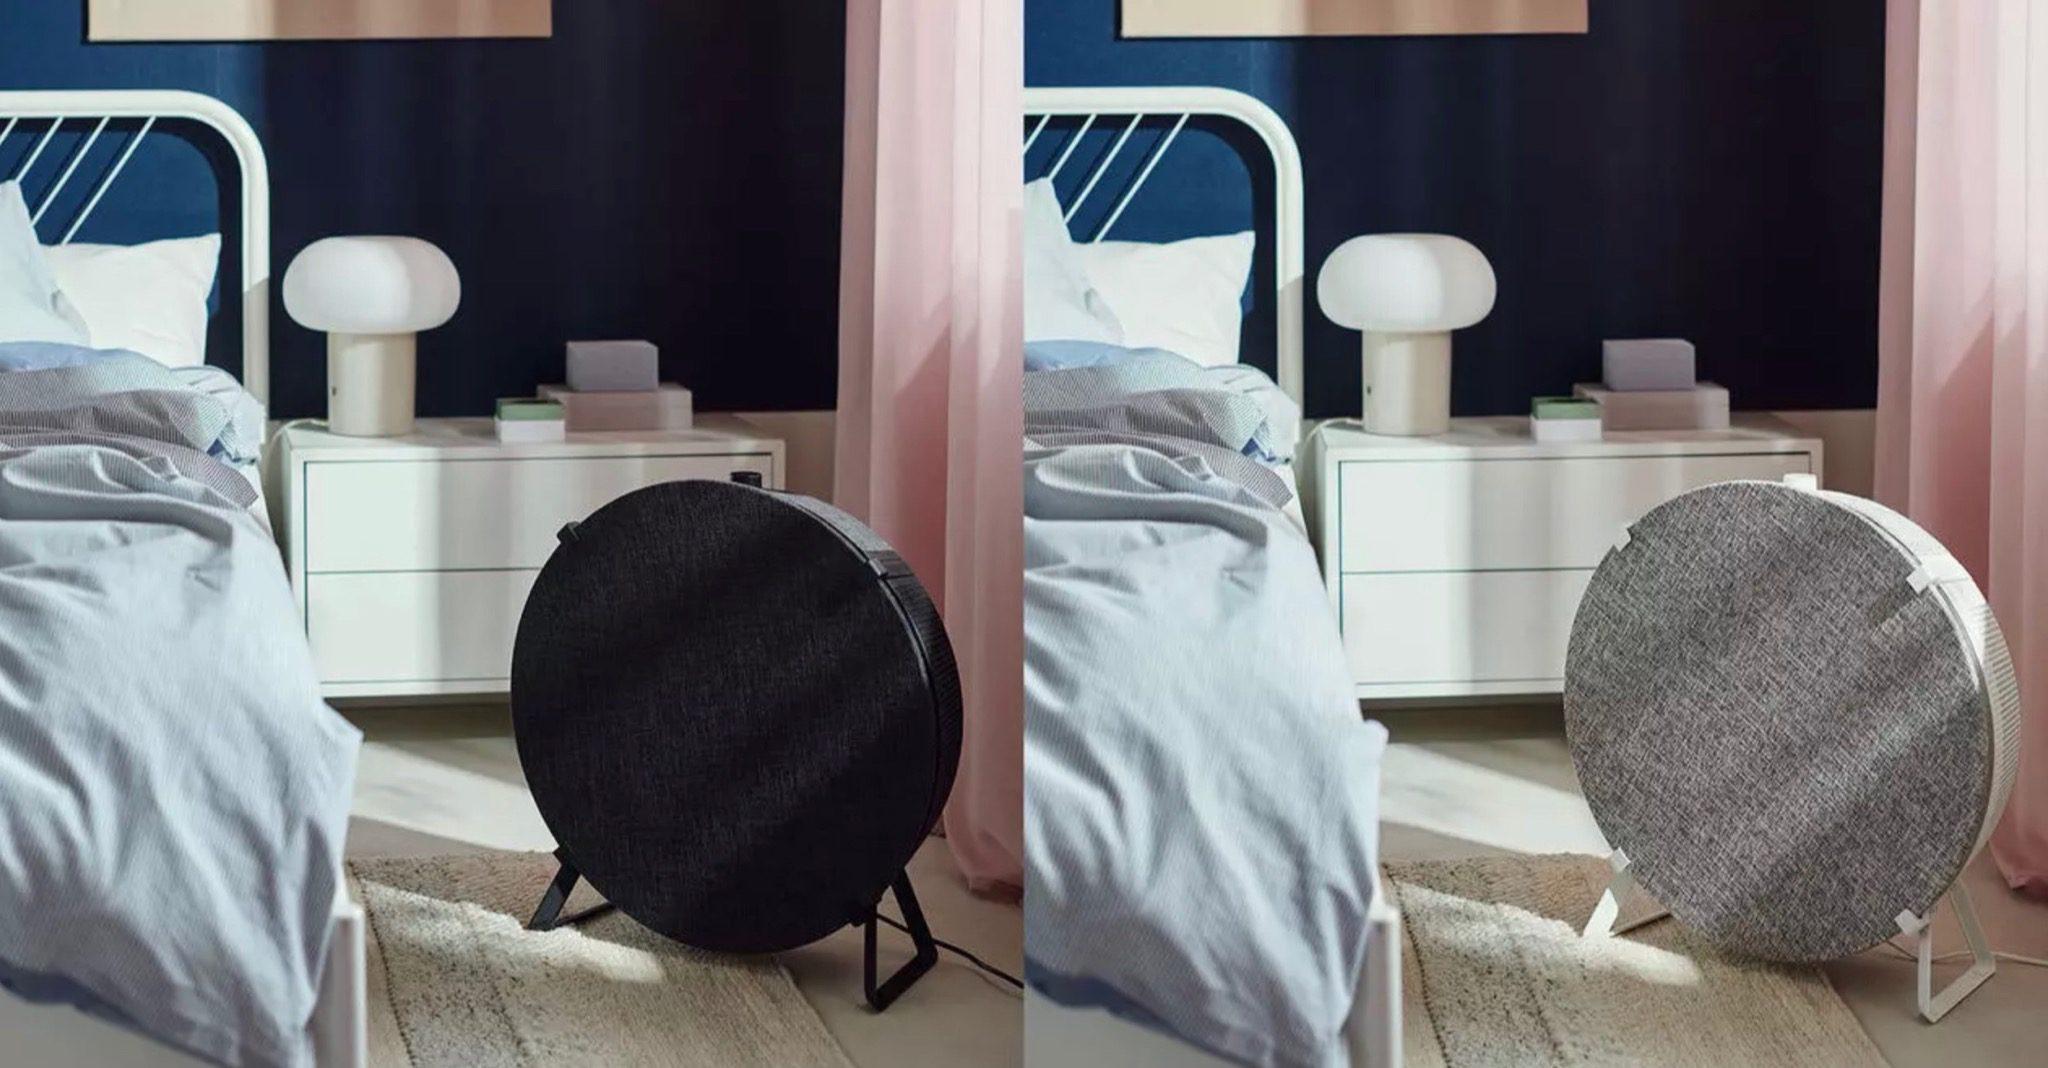 Ikea purificator Starkvind